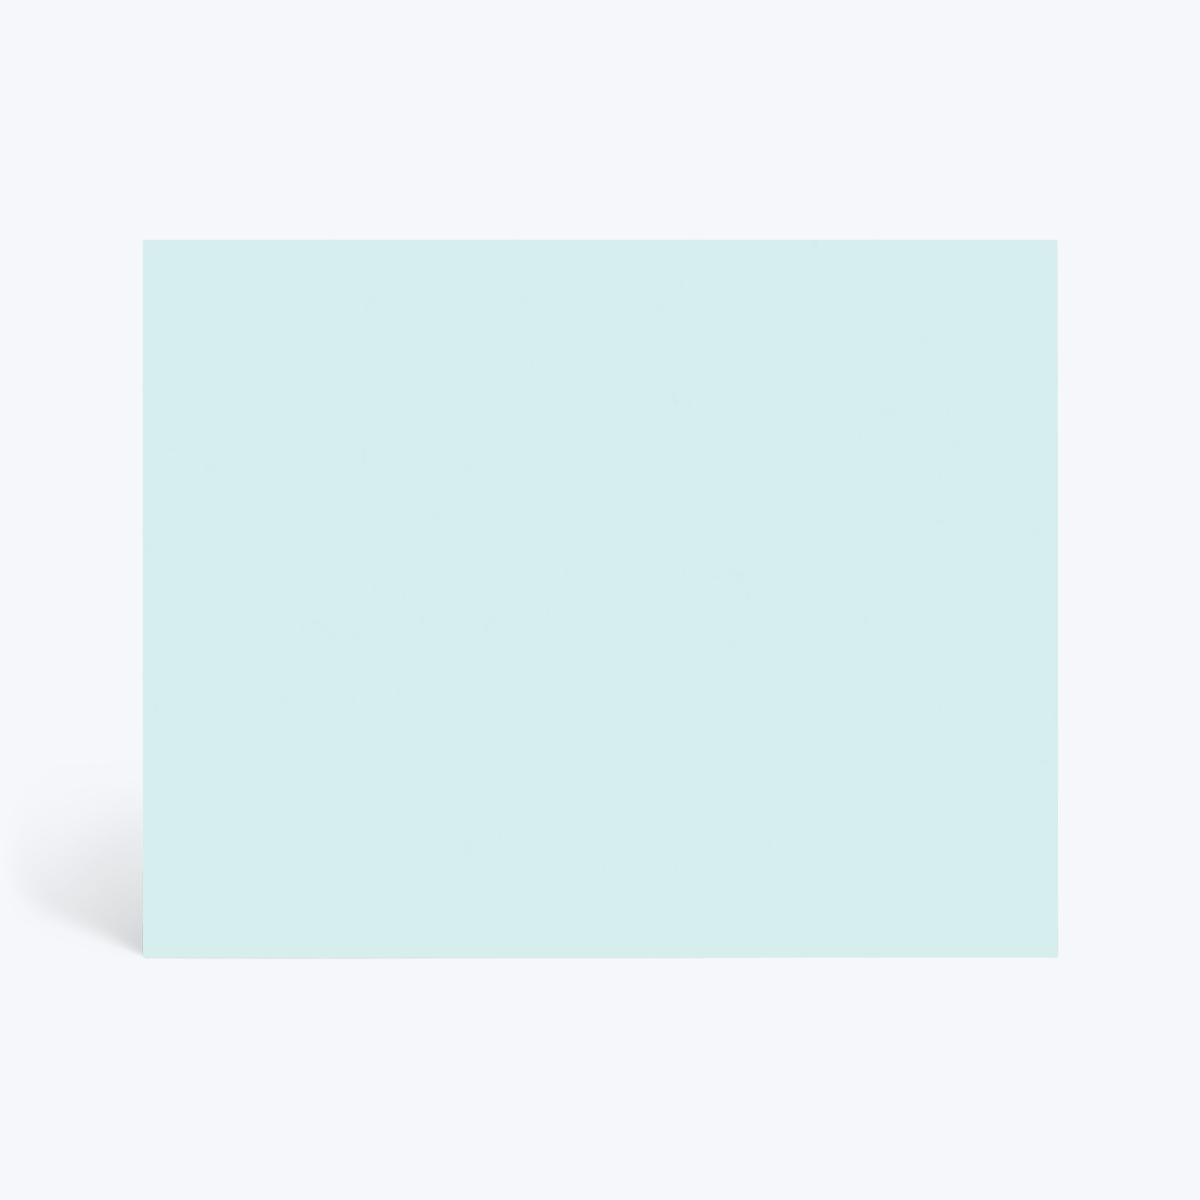 Https%3a%2f%2fwww.papier.com%2fproduct image%2f42690%2f29%2fcolour block 10899 back 1533563704.png?ixlib=rb 1.1